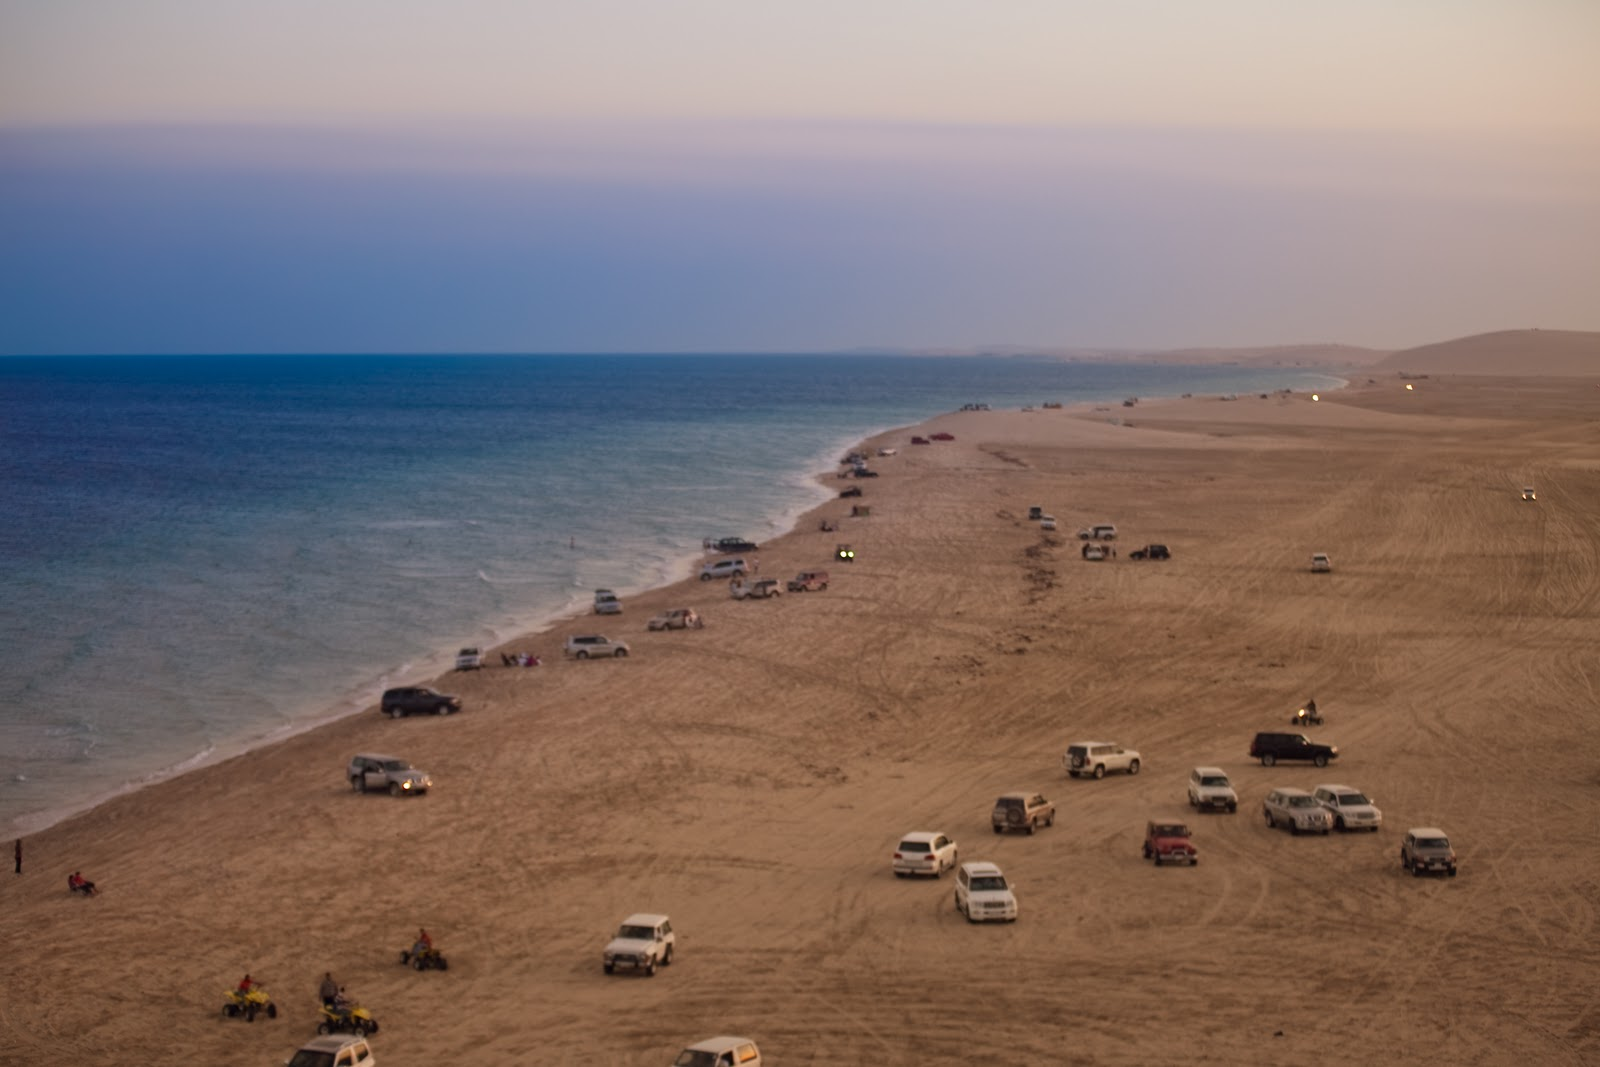 Mesaieed Qatar  city photos gallery : Arjunpuri in Qatar: Mesaieed Beach in Qatar